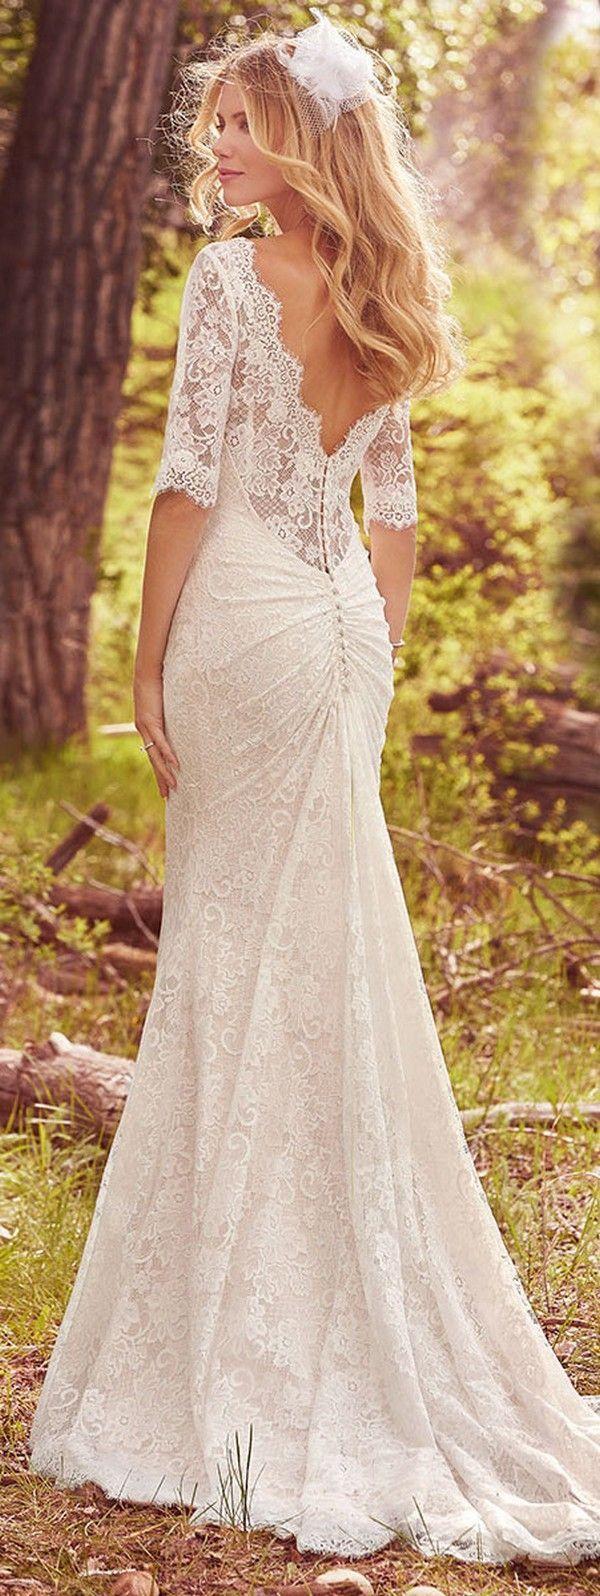 Maggie sottero vintage lace wedding dress for dream dress